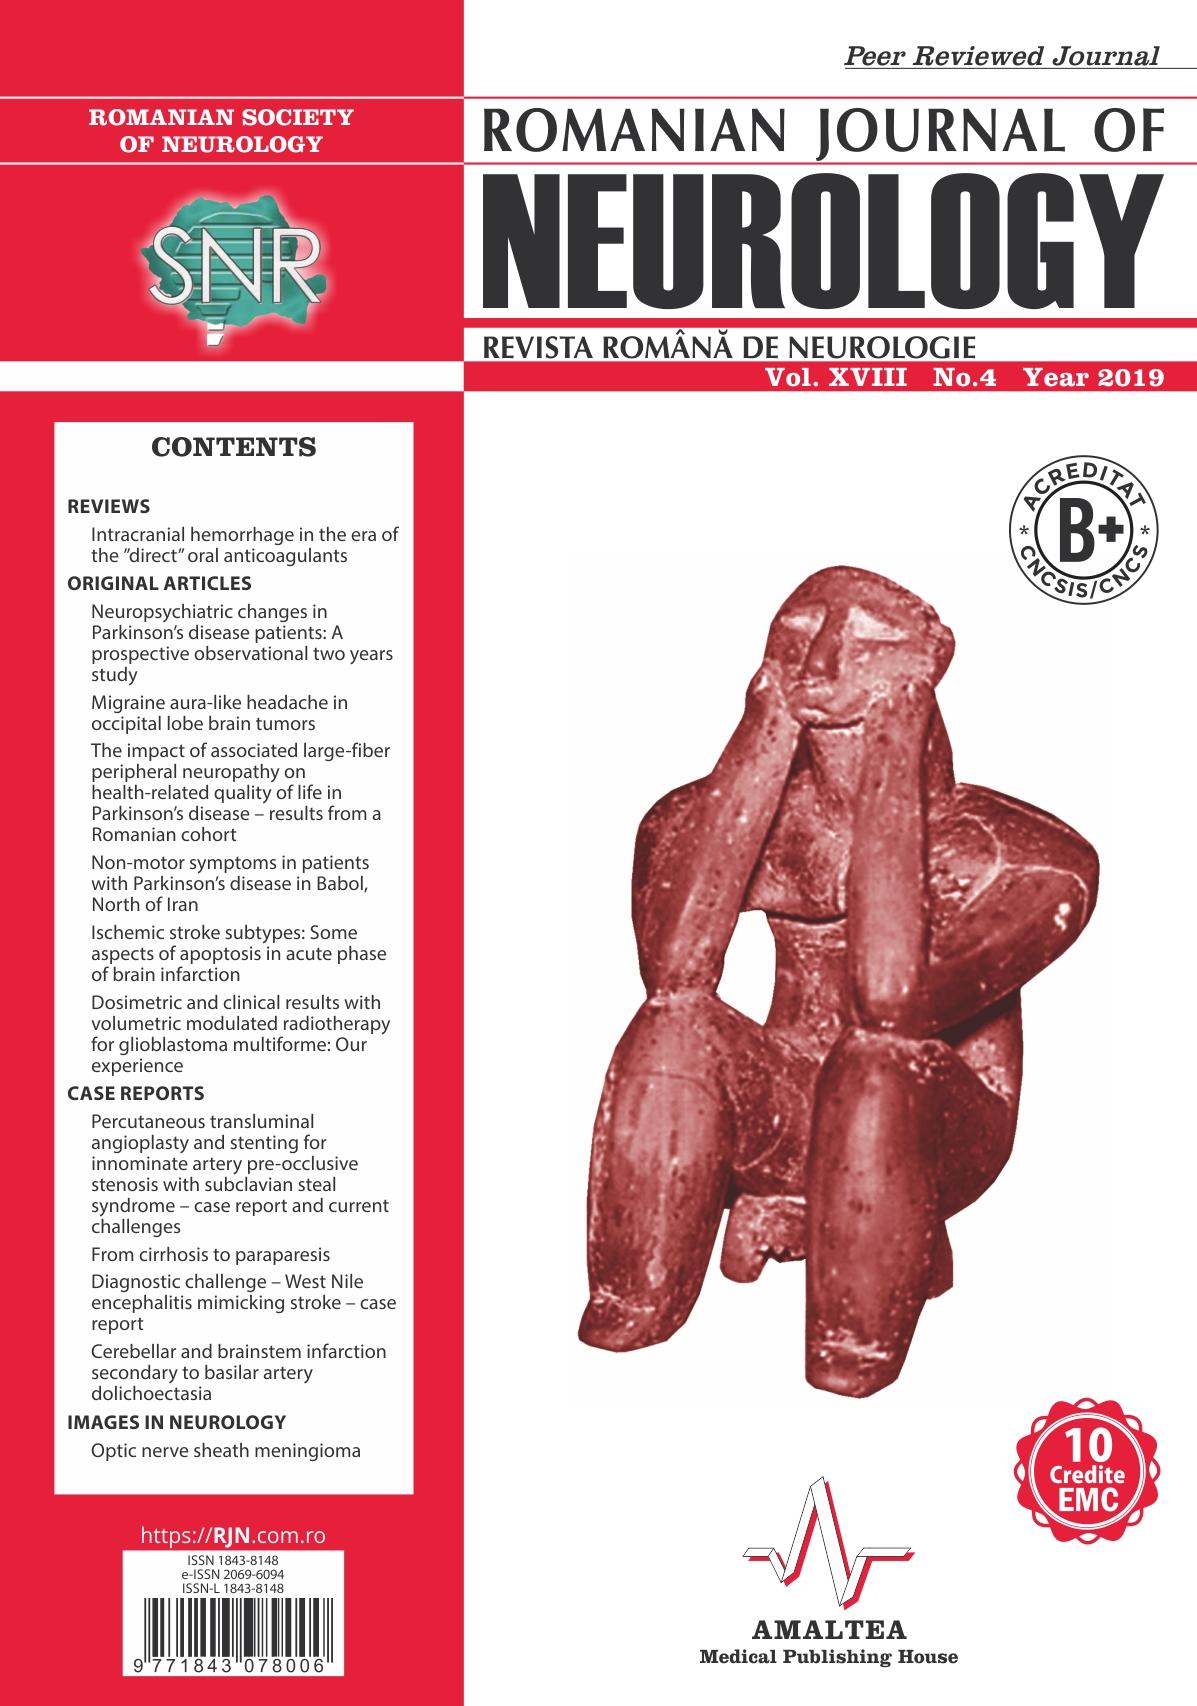 Romanian Journal of Neurology, Volume XVIII, No. 4, 2019